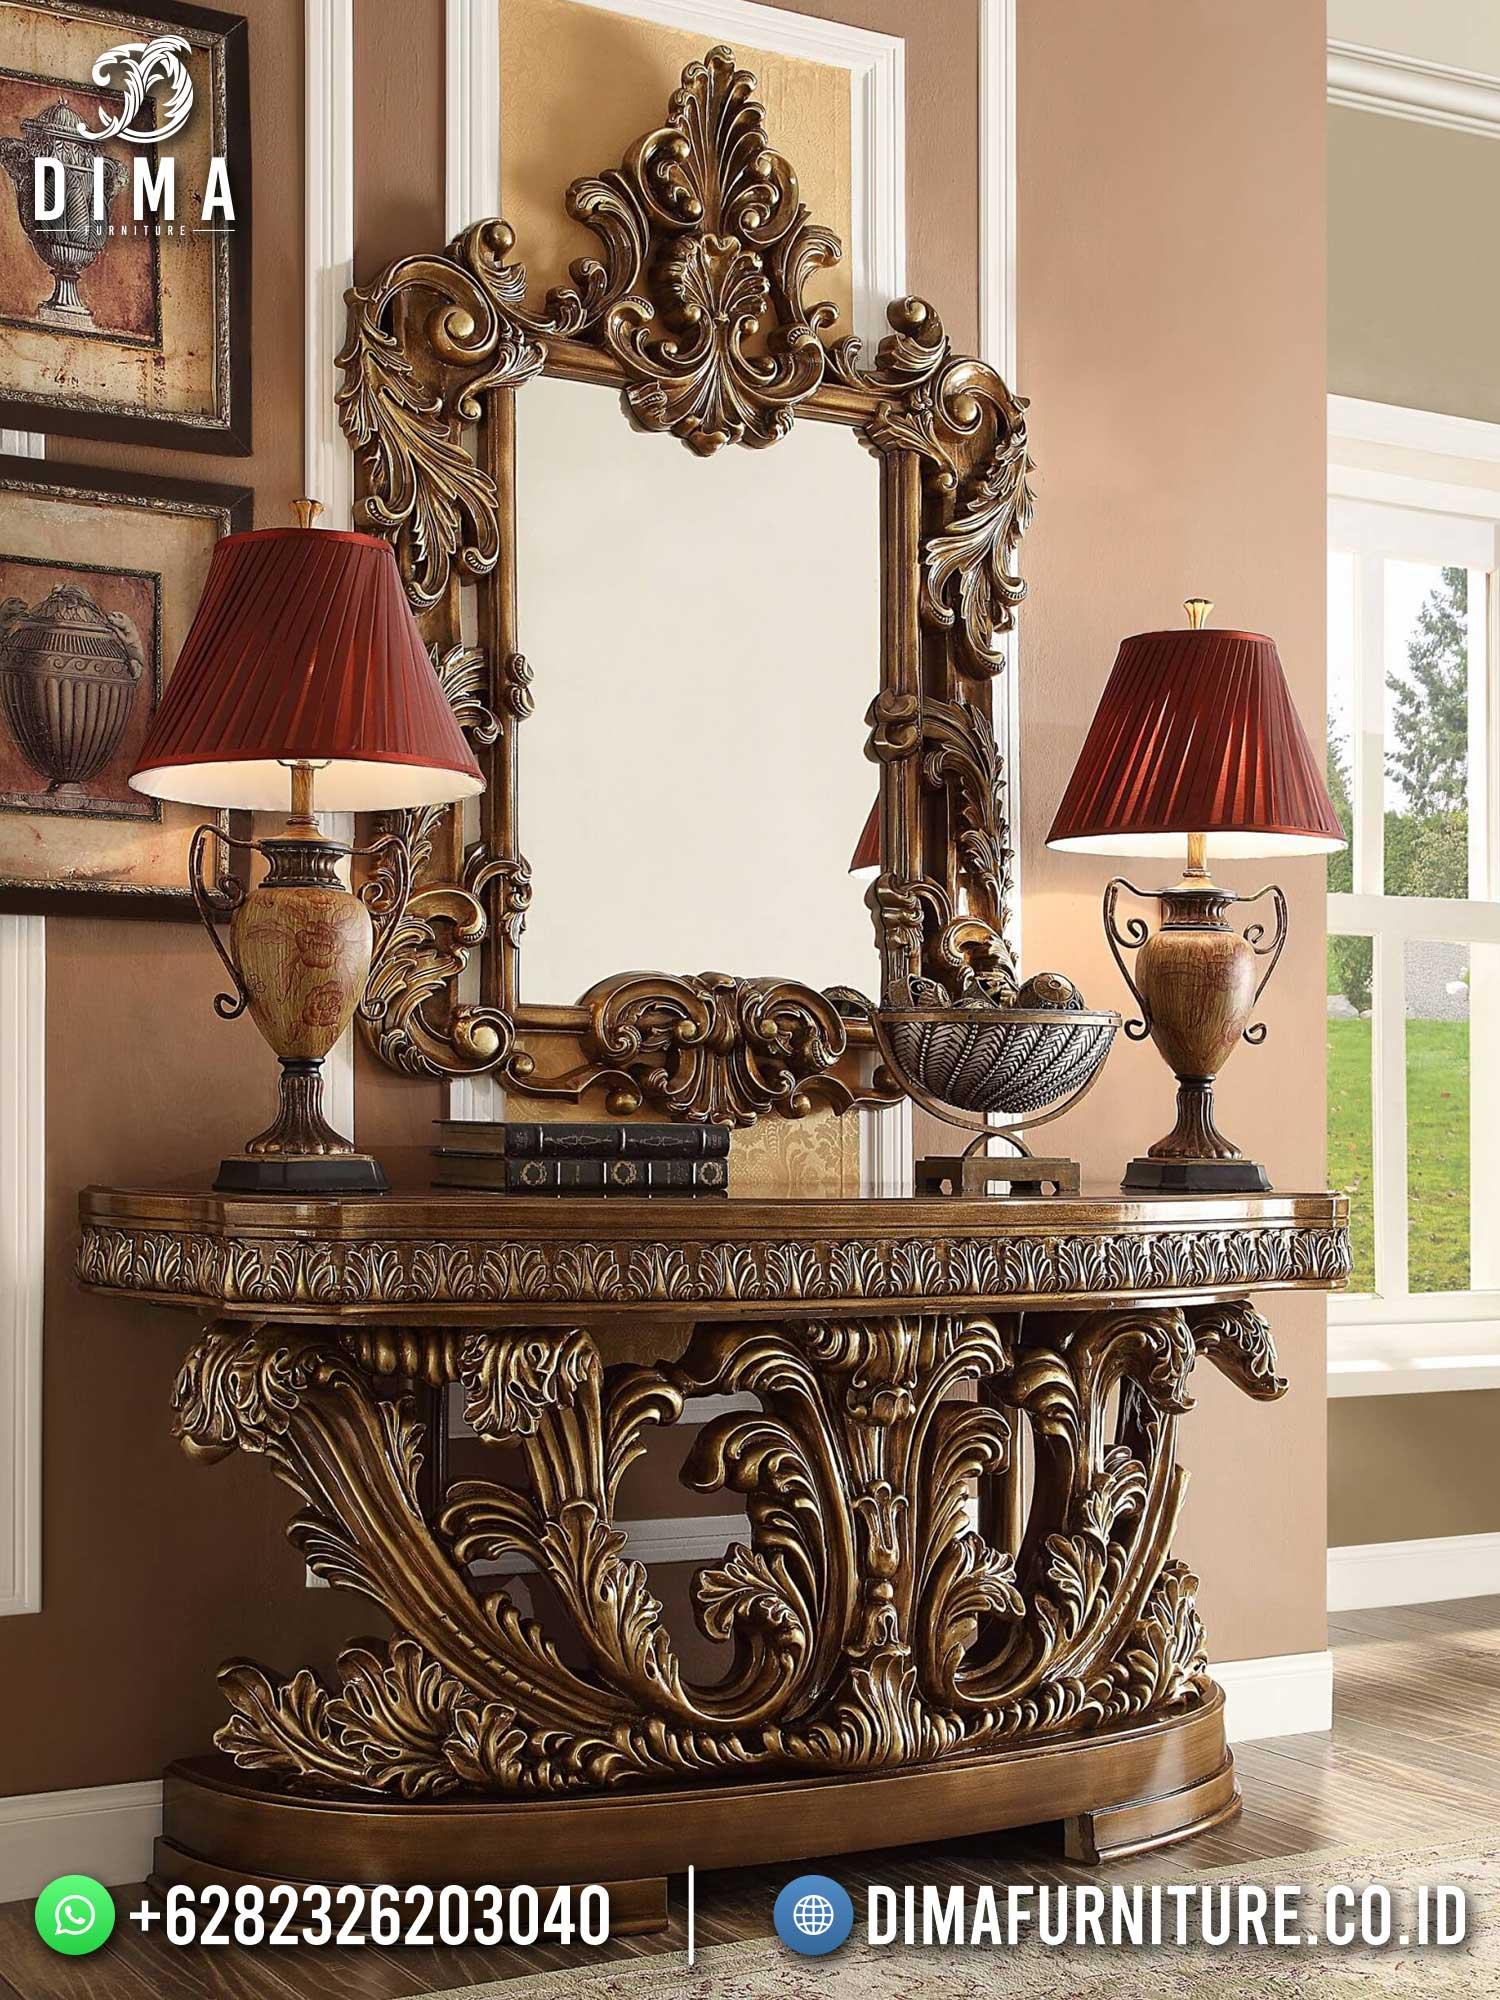 Harga Meja Konsul Mewah Jepara Excellent Duco Color Great Emoire Style TTJ-1706